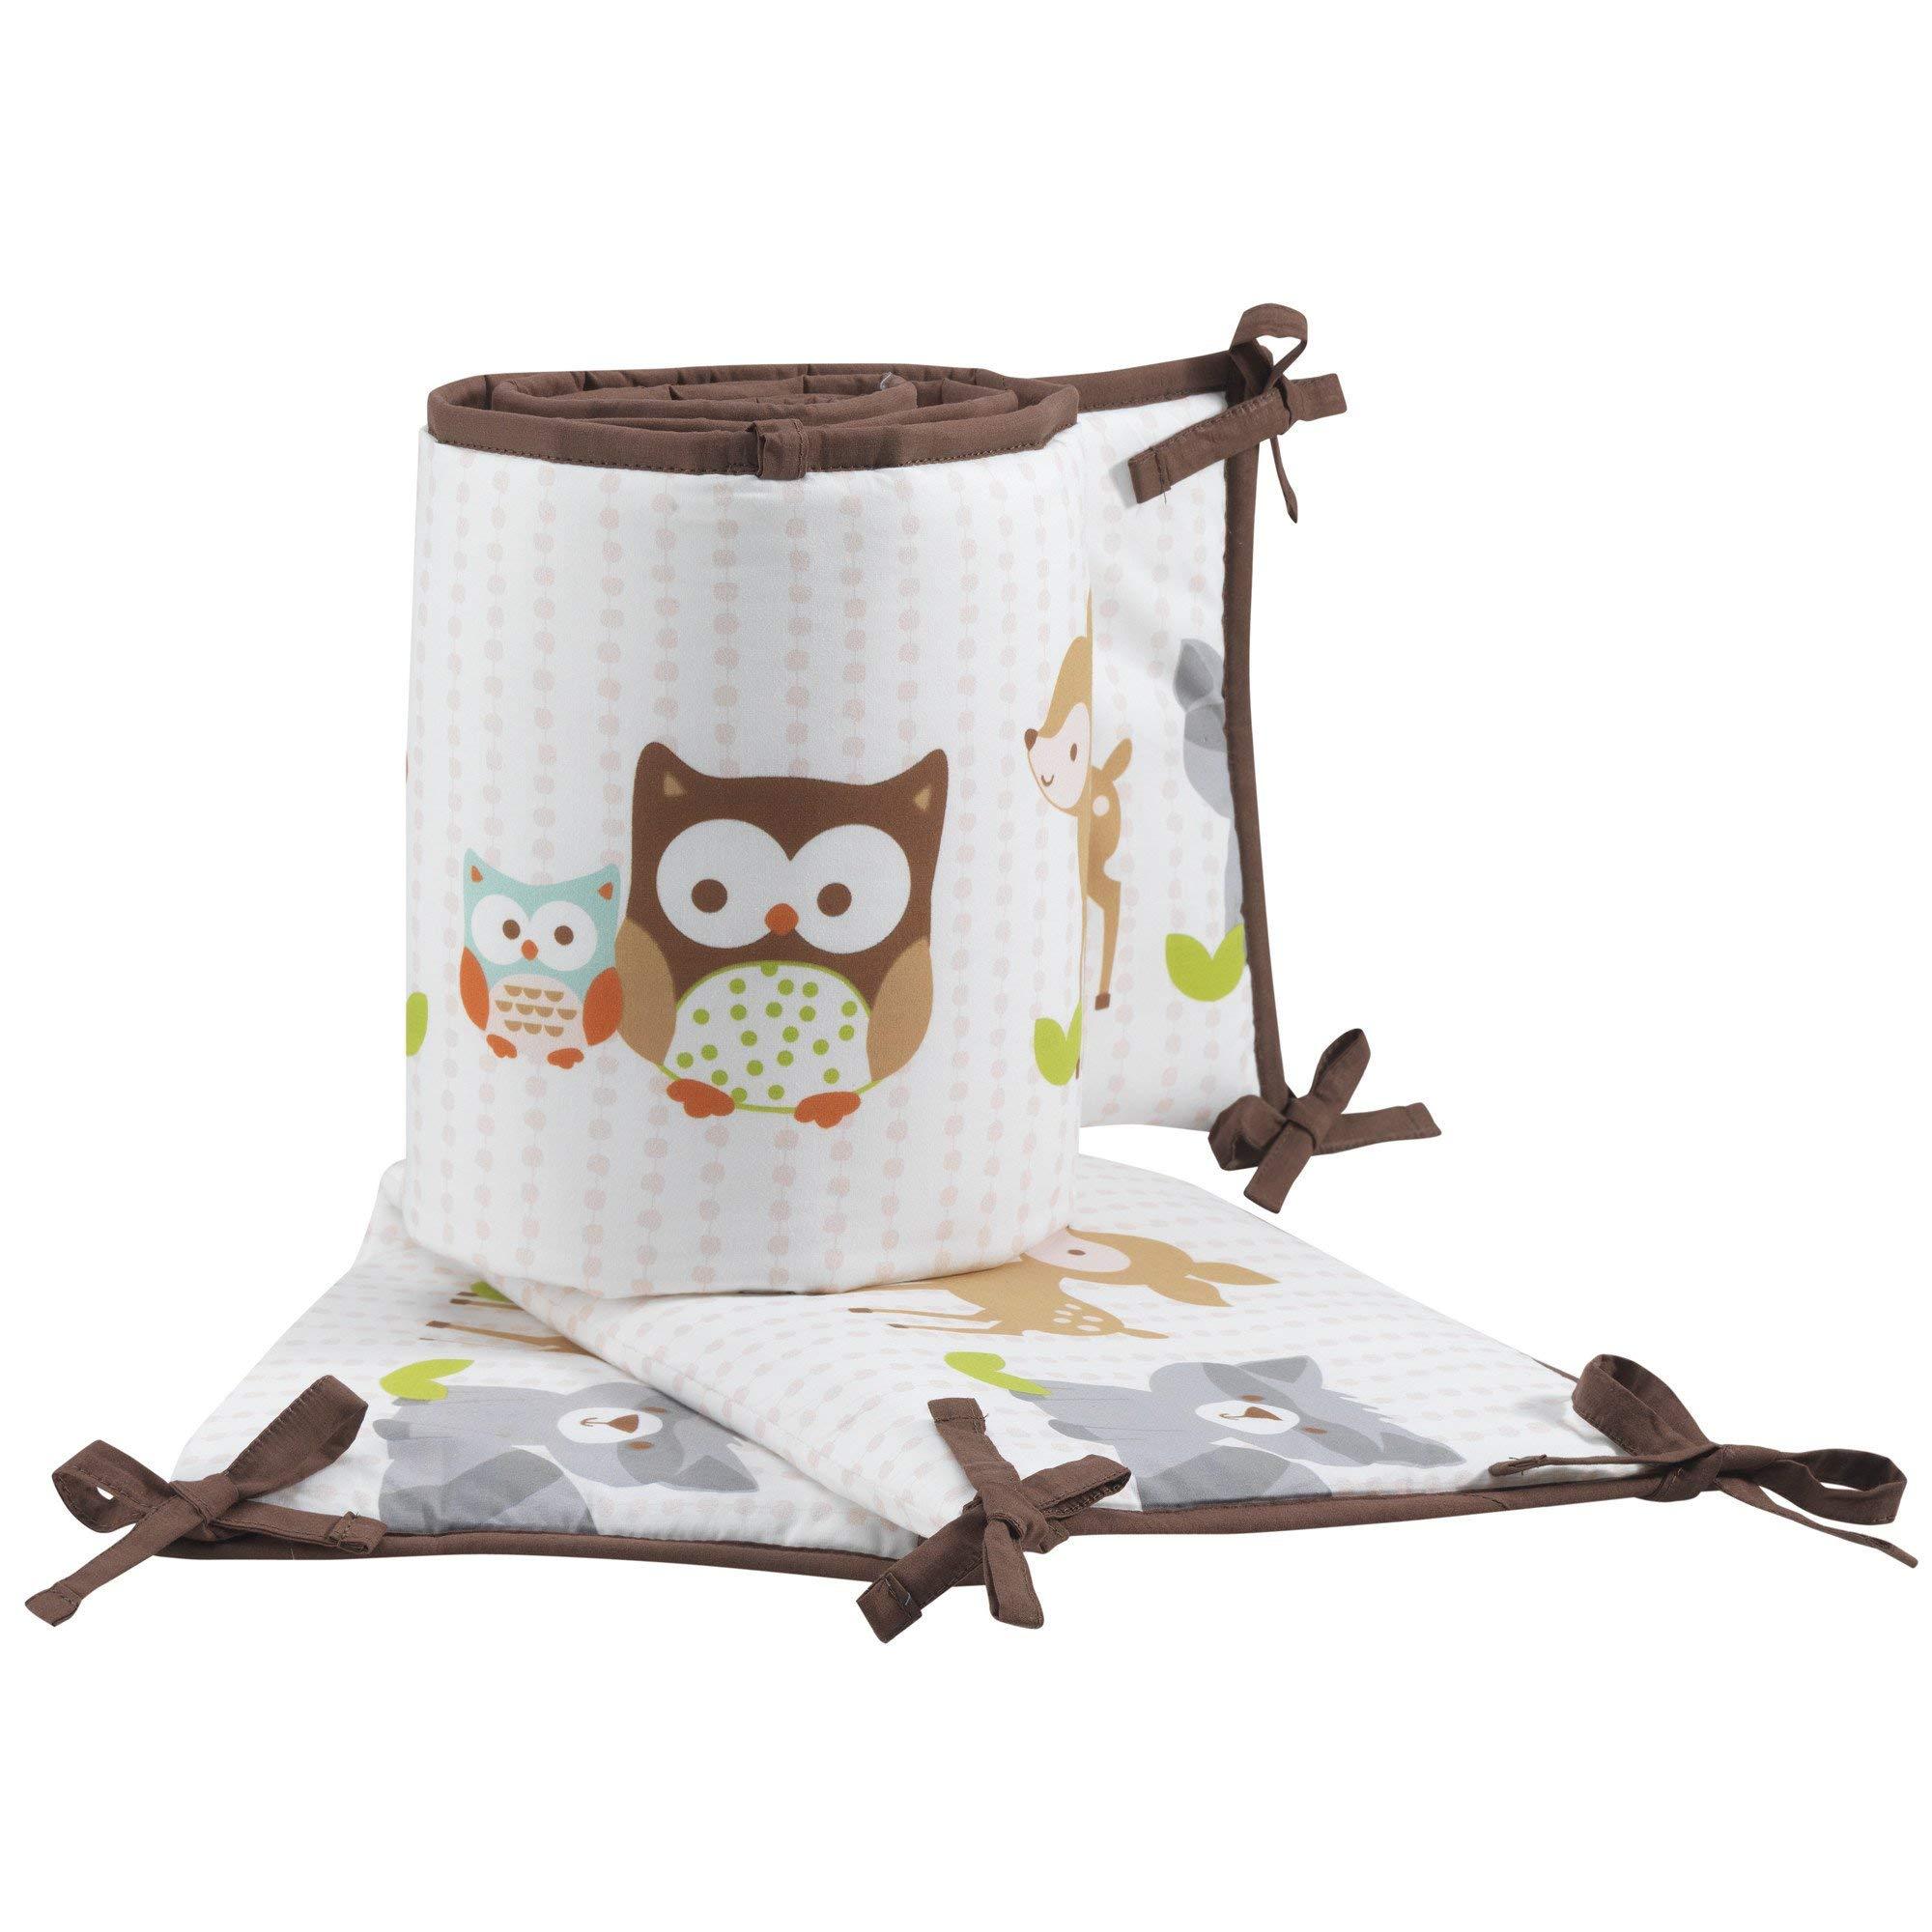 Bedtime Originals Friendly Forest Woodland, 4 Piece Crib Bumper, Green/Brown by Bedtime Originals